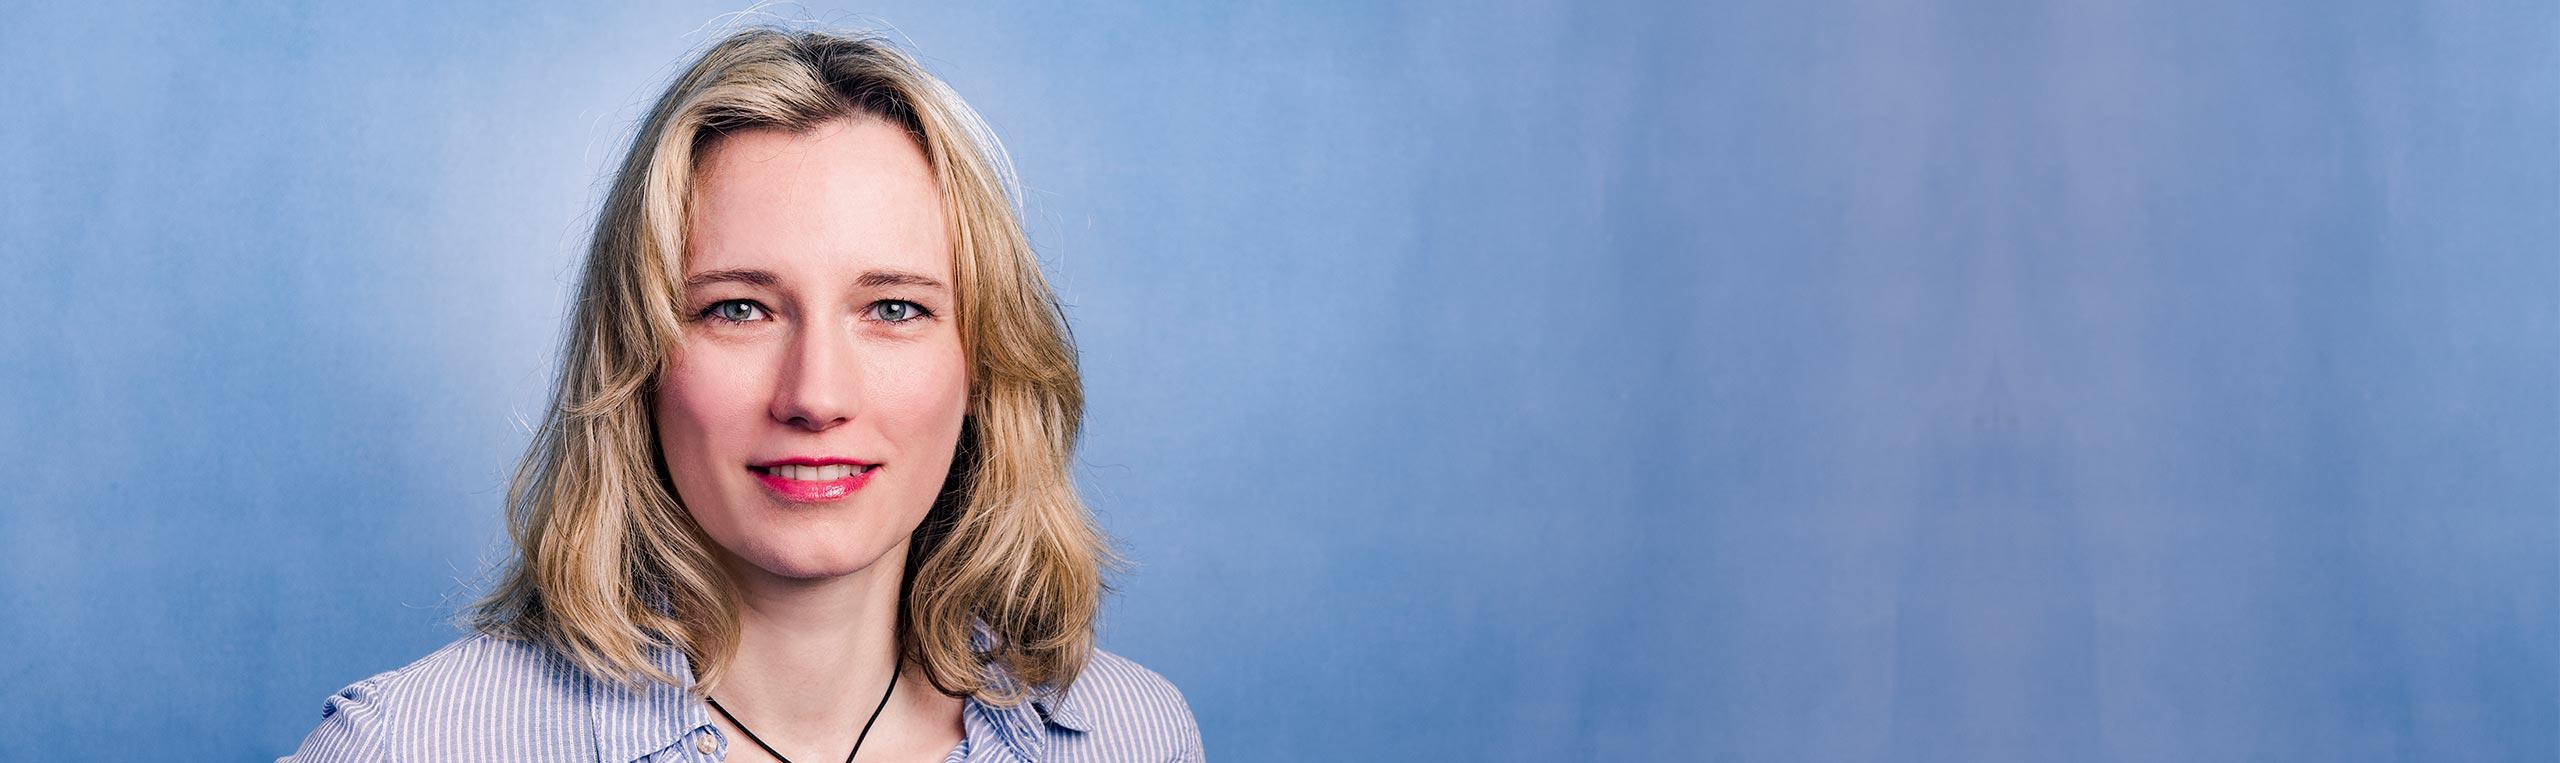 Verena Hartmann